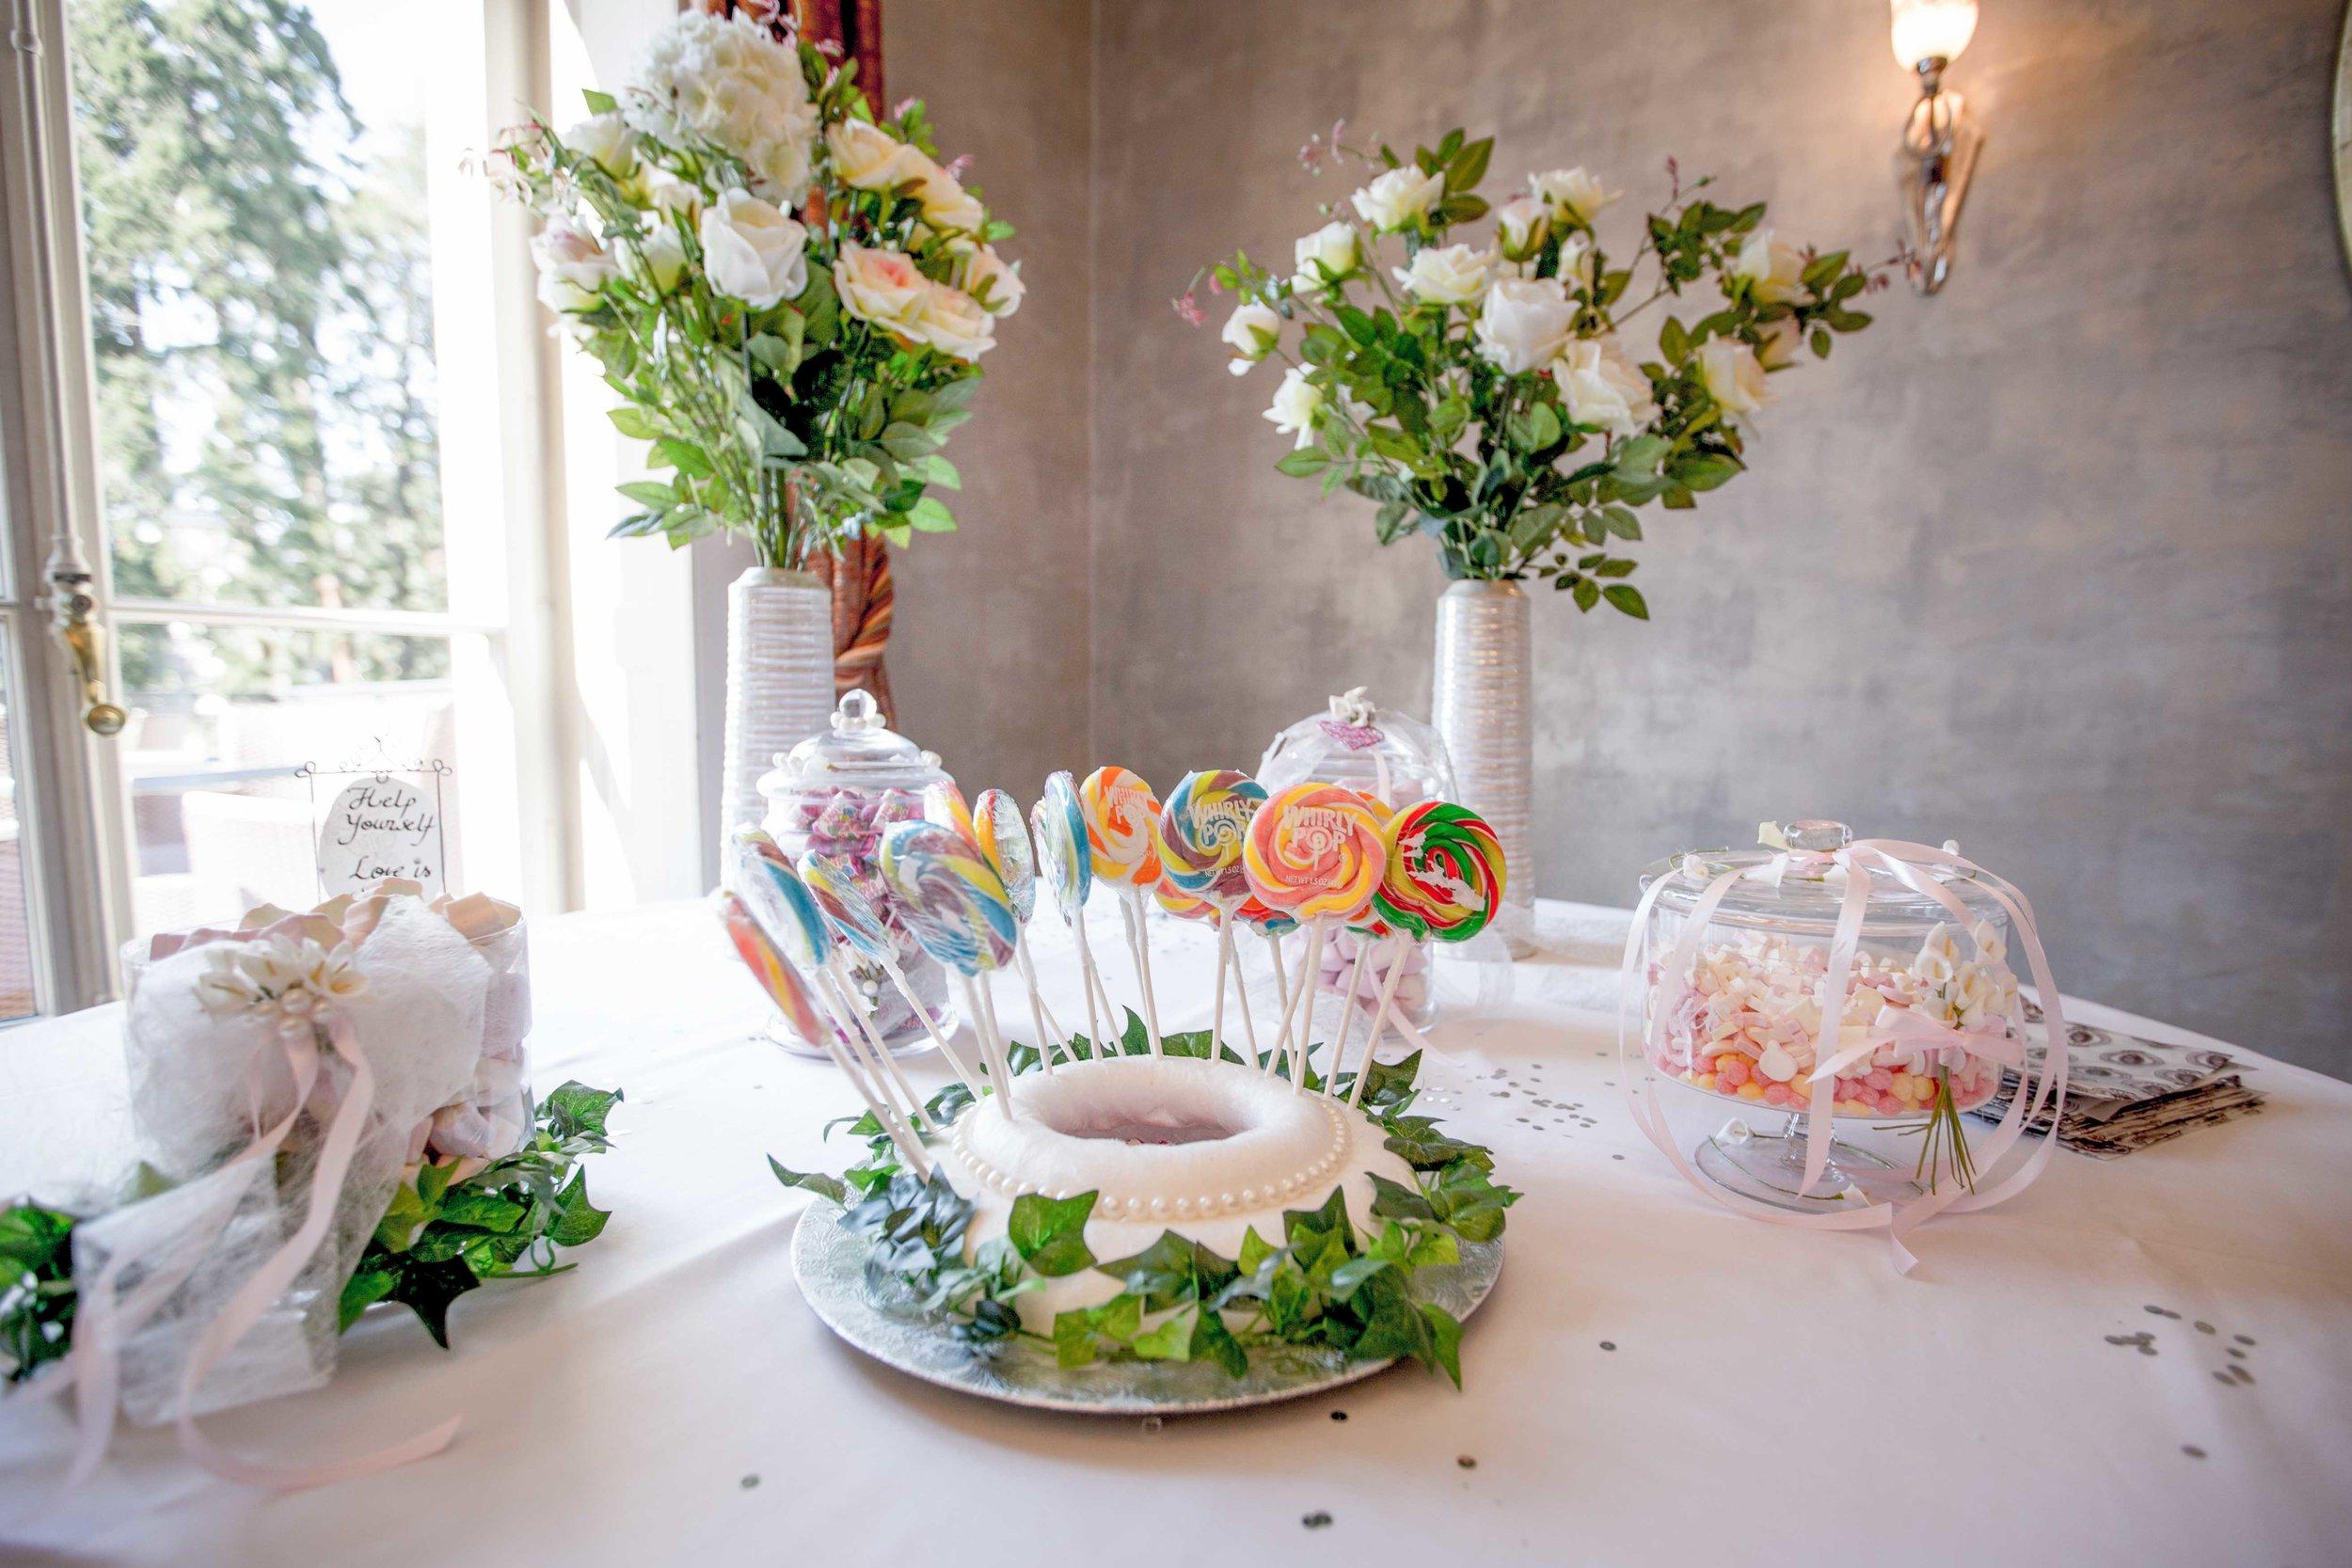 parc-des-eaux-vives-destination-wedding-photographer-geneva-switzerland-natalia-smith-photography-30.jpg